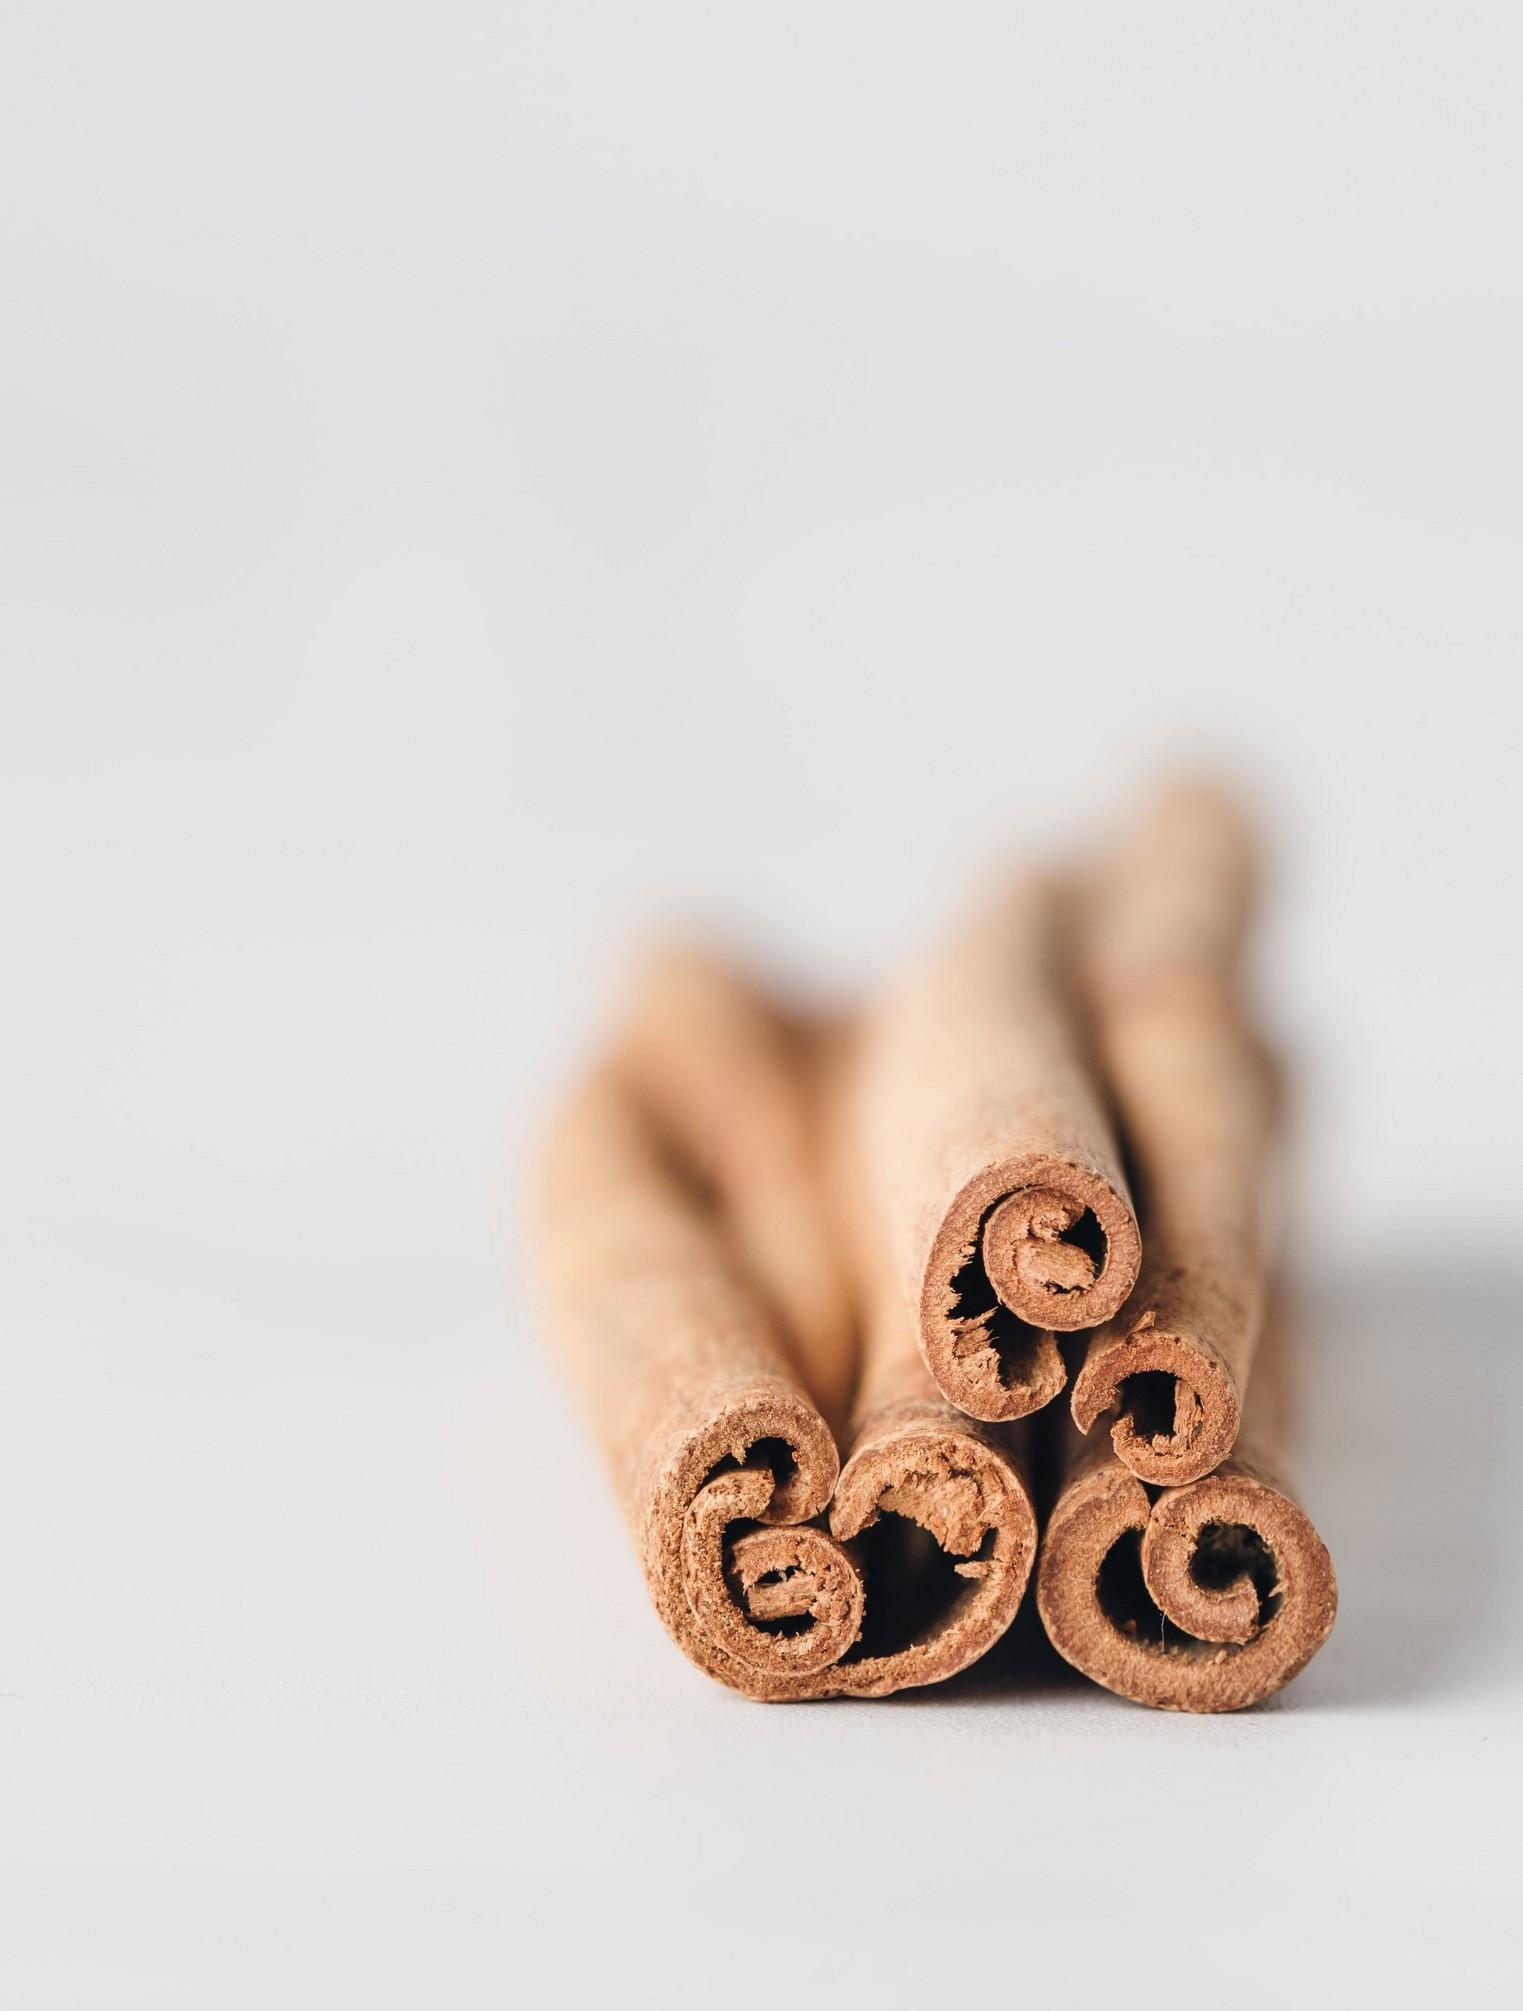 tops of horizontal cinnamon sticks on a white background